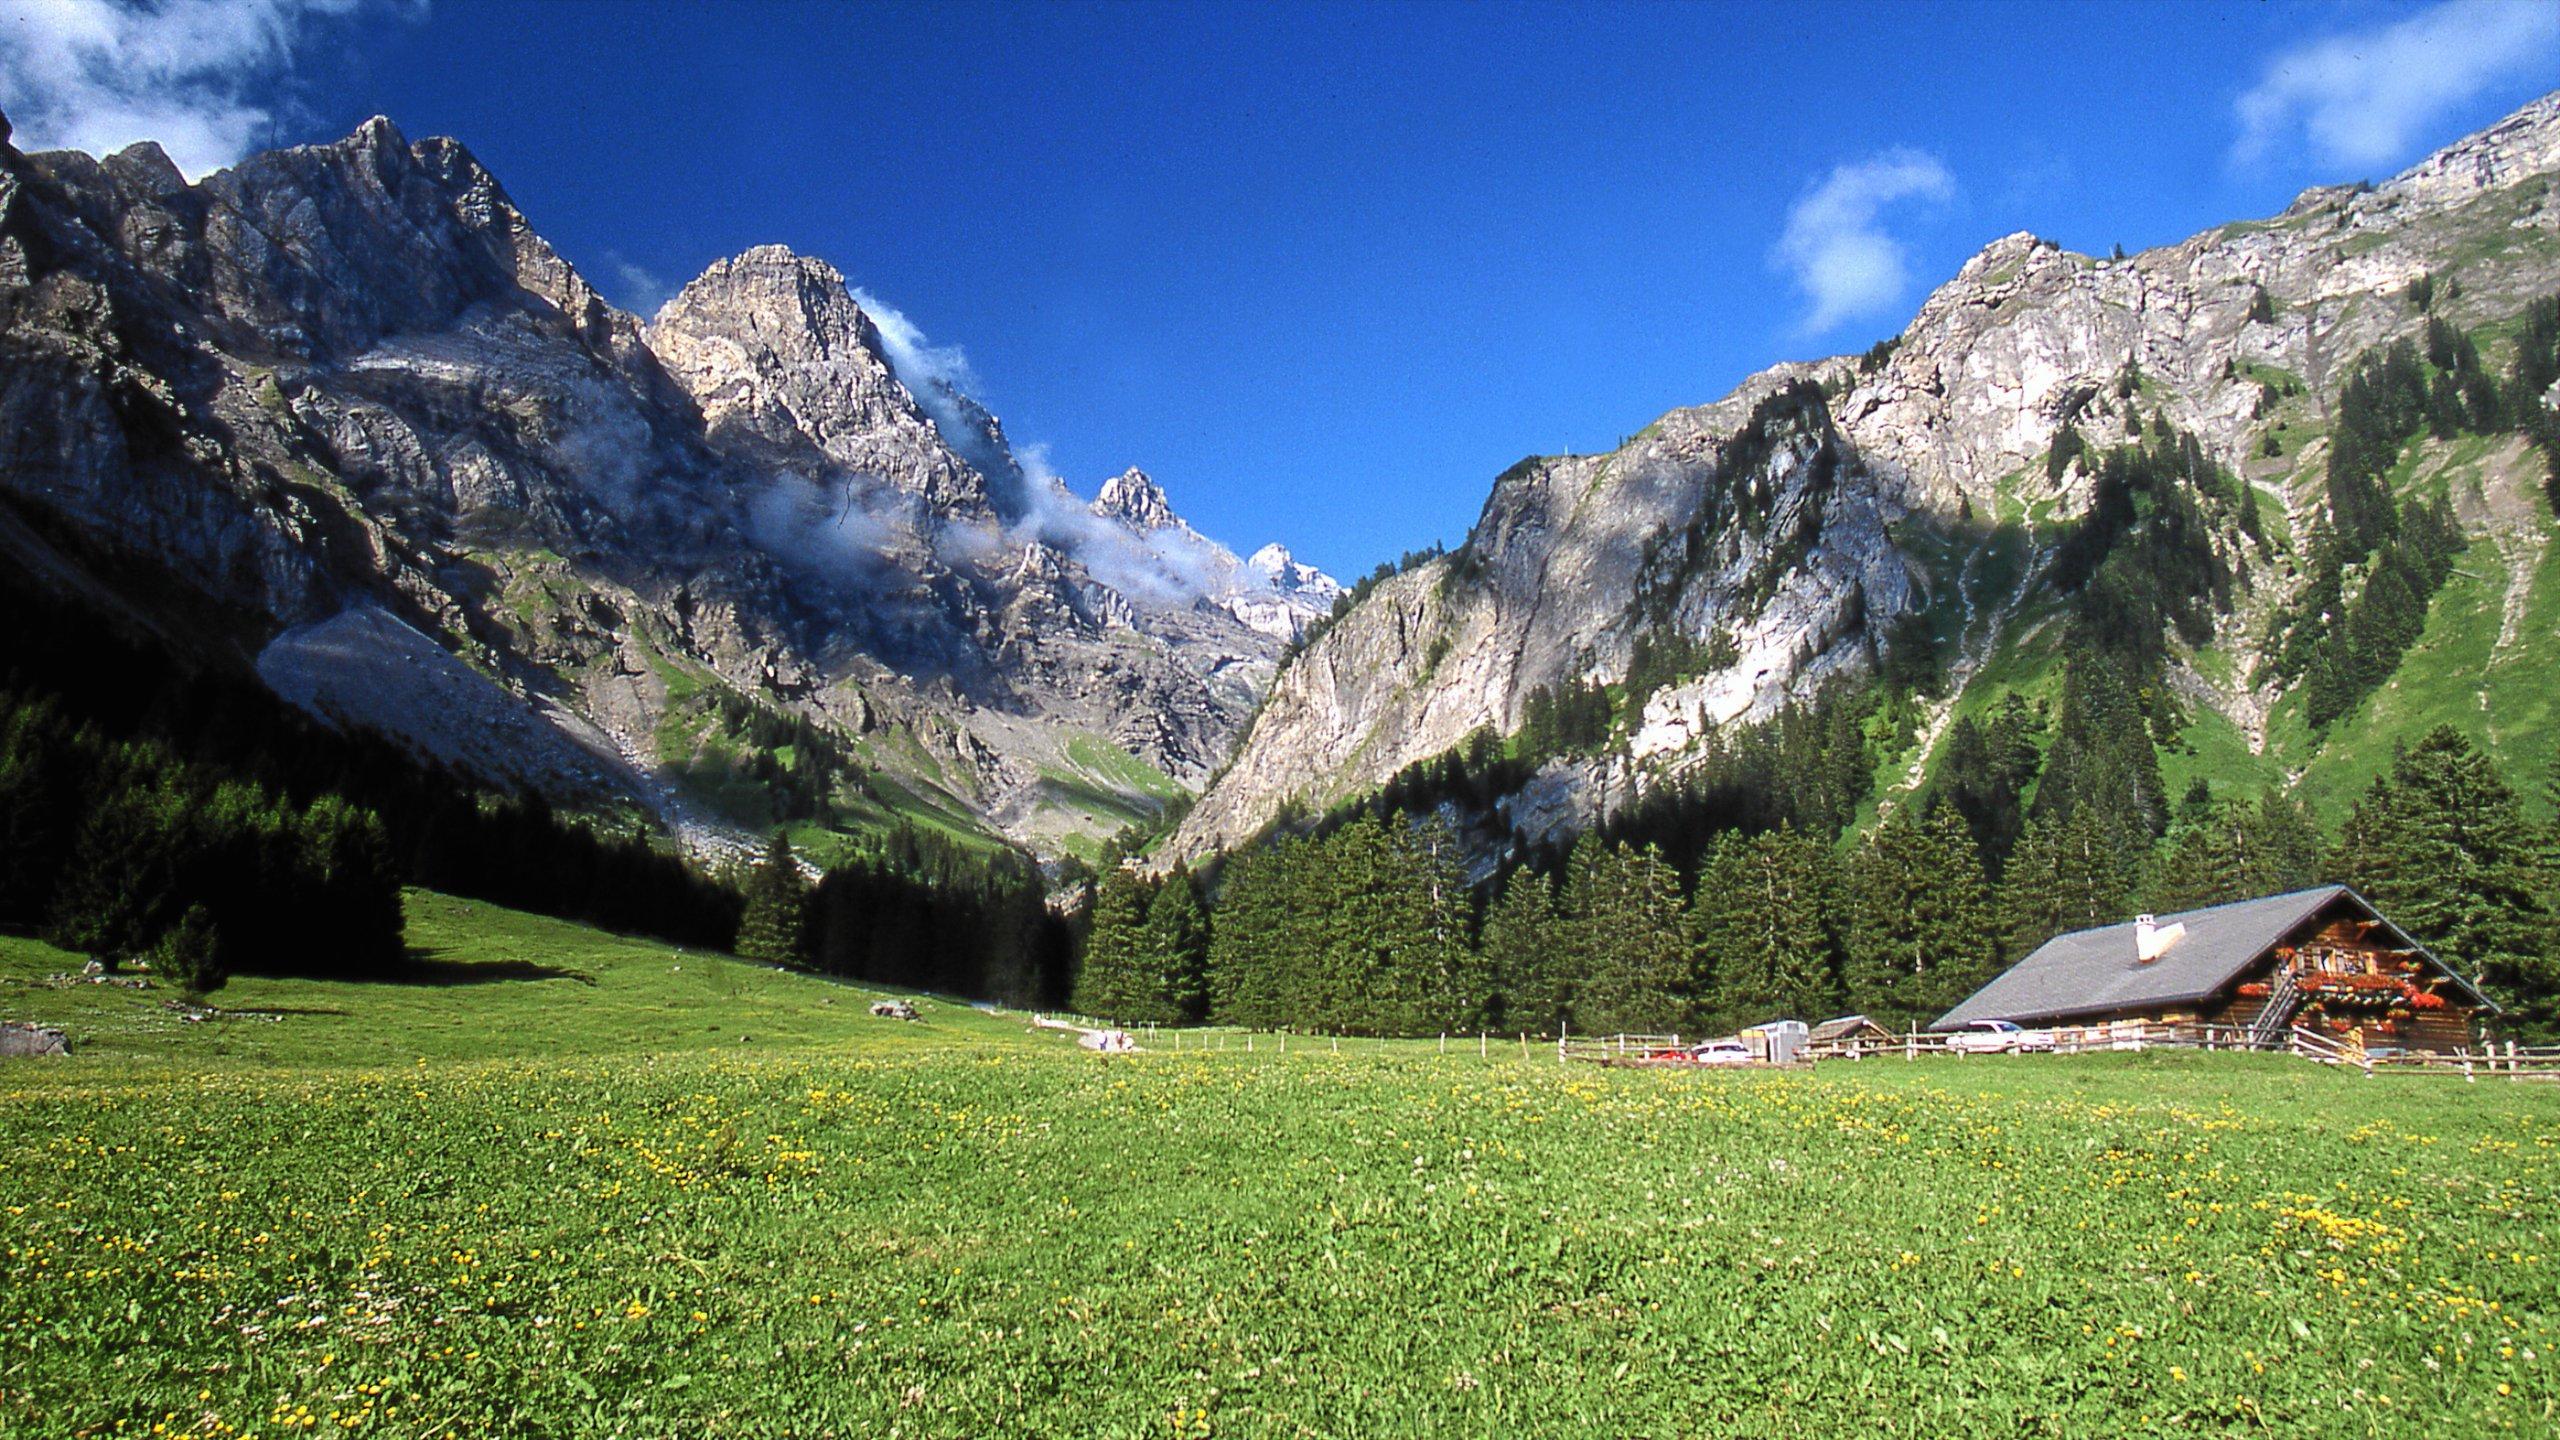 Alpe des Chaux, Gryon, Canton of Vaud, Switzerland